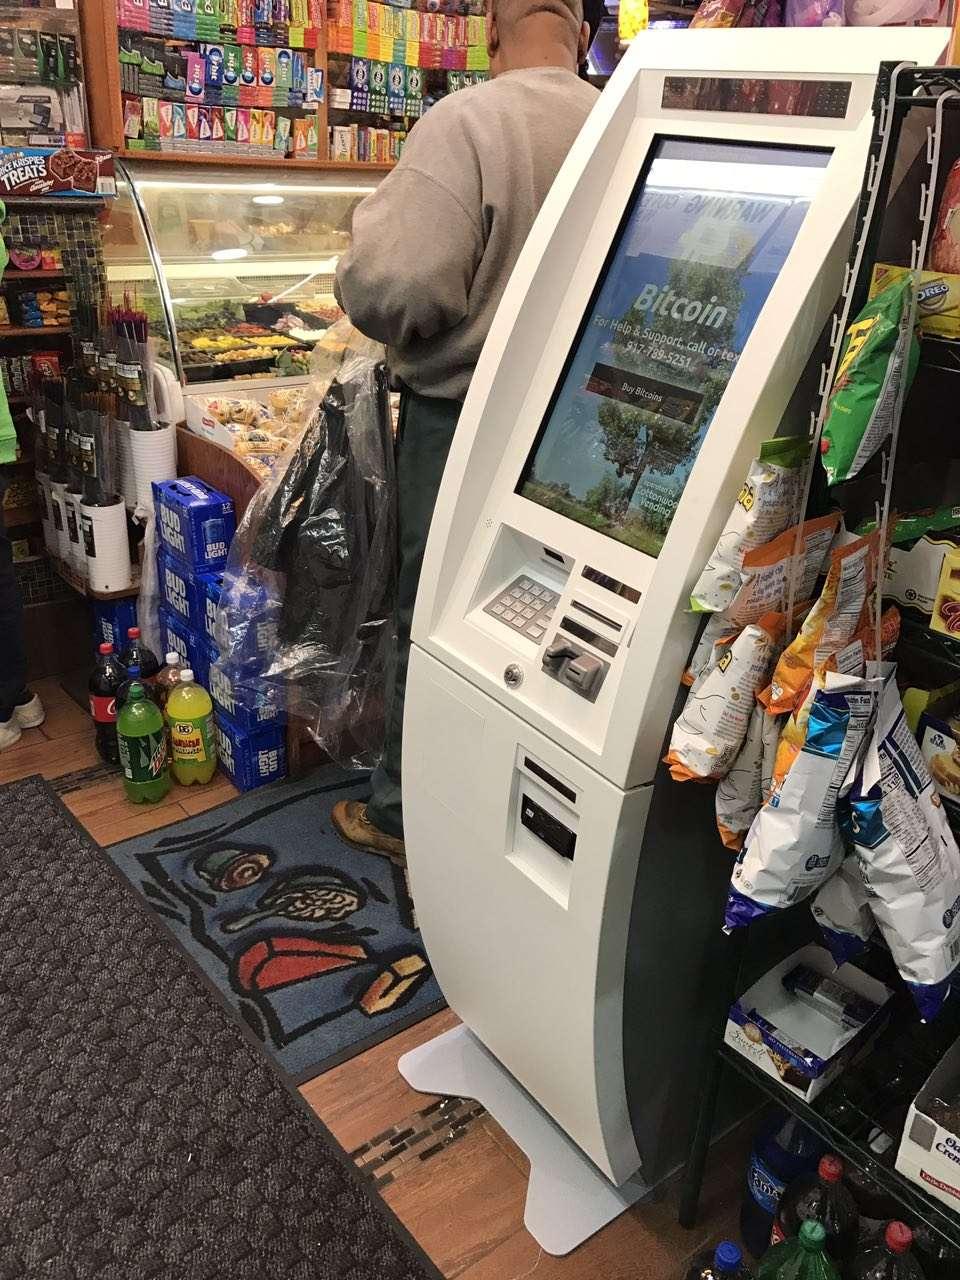 CoinBTM - Bitcoin ATM - atm  | Photo 8 of 10 | Address: 1500 Castle Hill Ave, Bronx, NY 10462, USA | Phone: (917) 789-5251